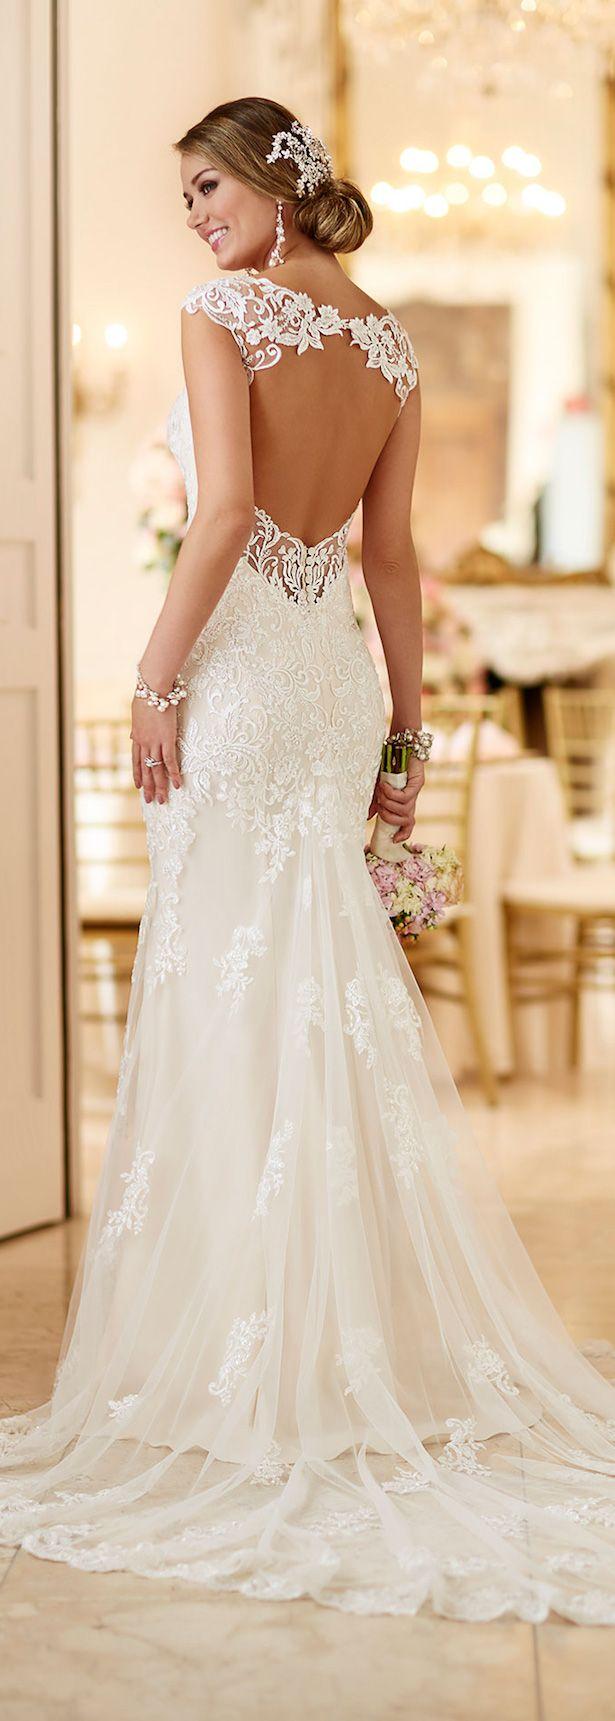 5b170b75a6c77ff63d3051841516bb32--wedding-dresses-mermaid-with-sleeves-open-backs-mermaid-tail-wedding-dress